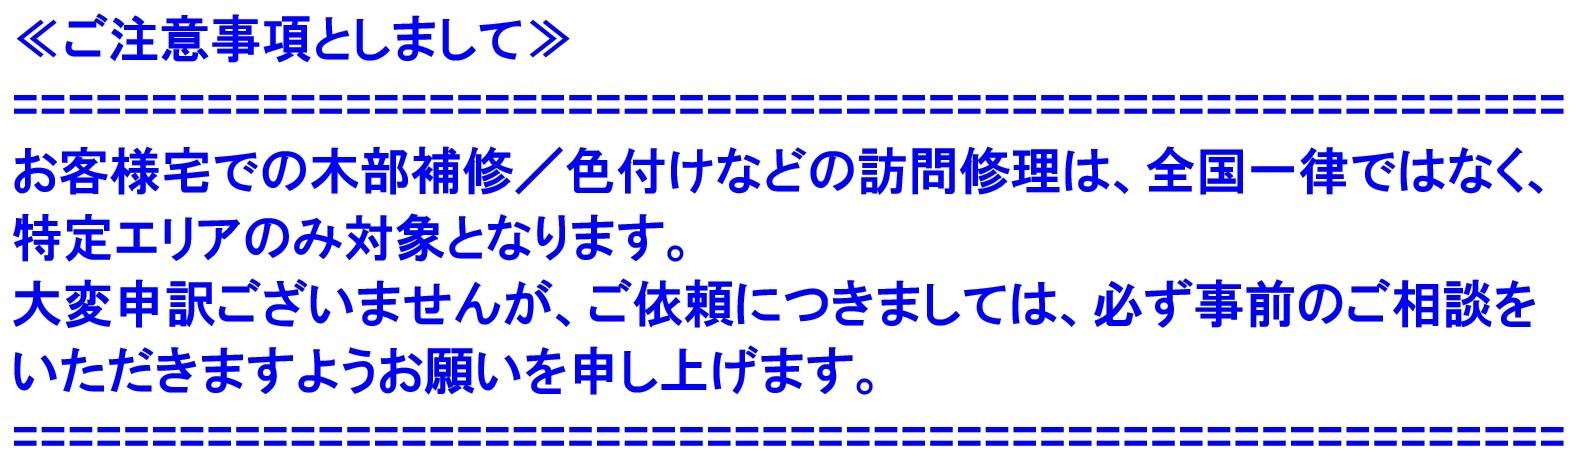 https://www.karimoku.co.jp/blog/repair/190406.jpg